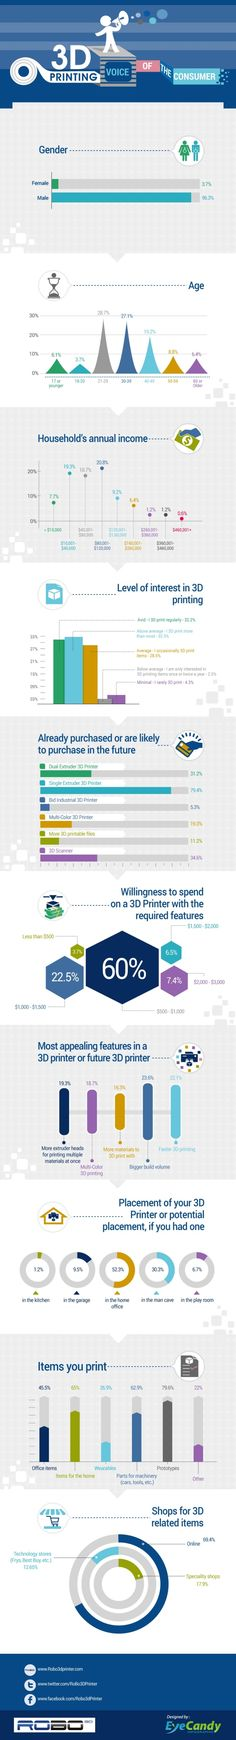 3ders.org - ROBO 3D announces results of the Big 3D Printing Consumer Survey   3D Printer News & 3D Printing News